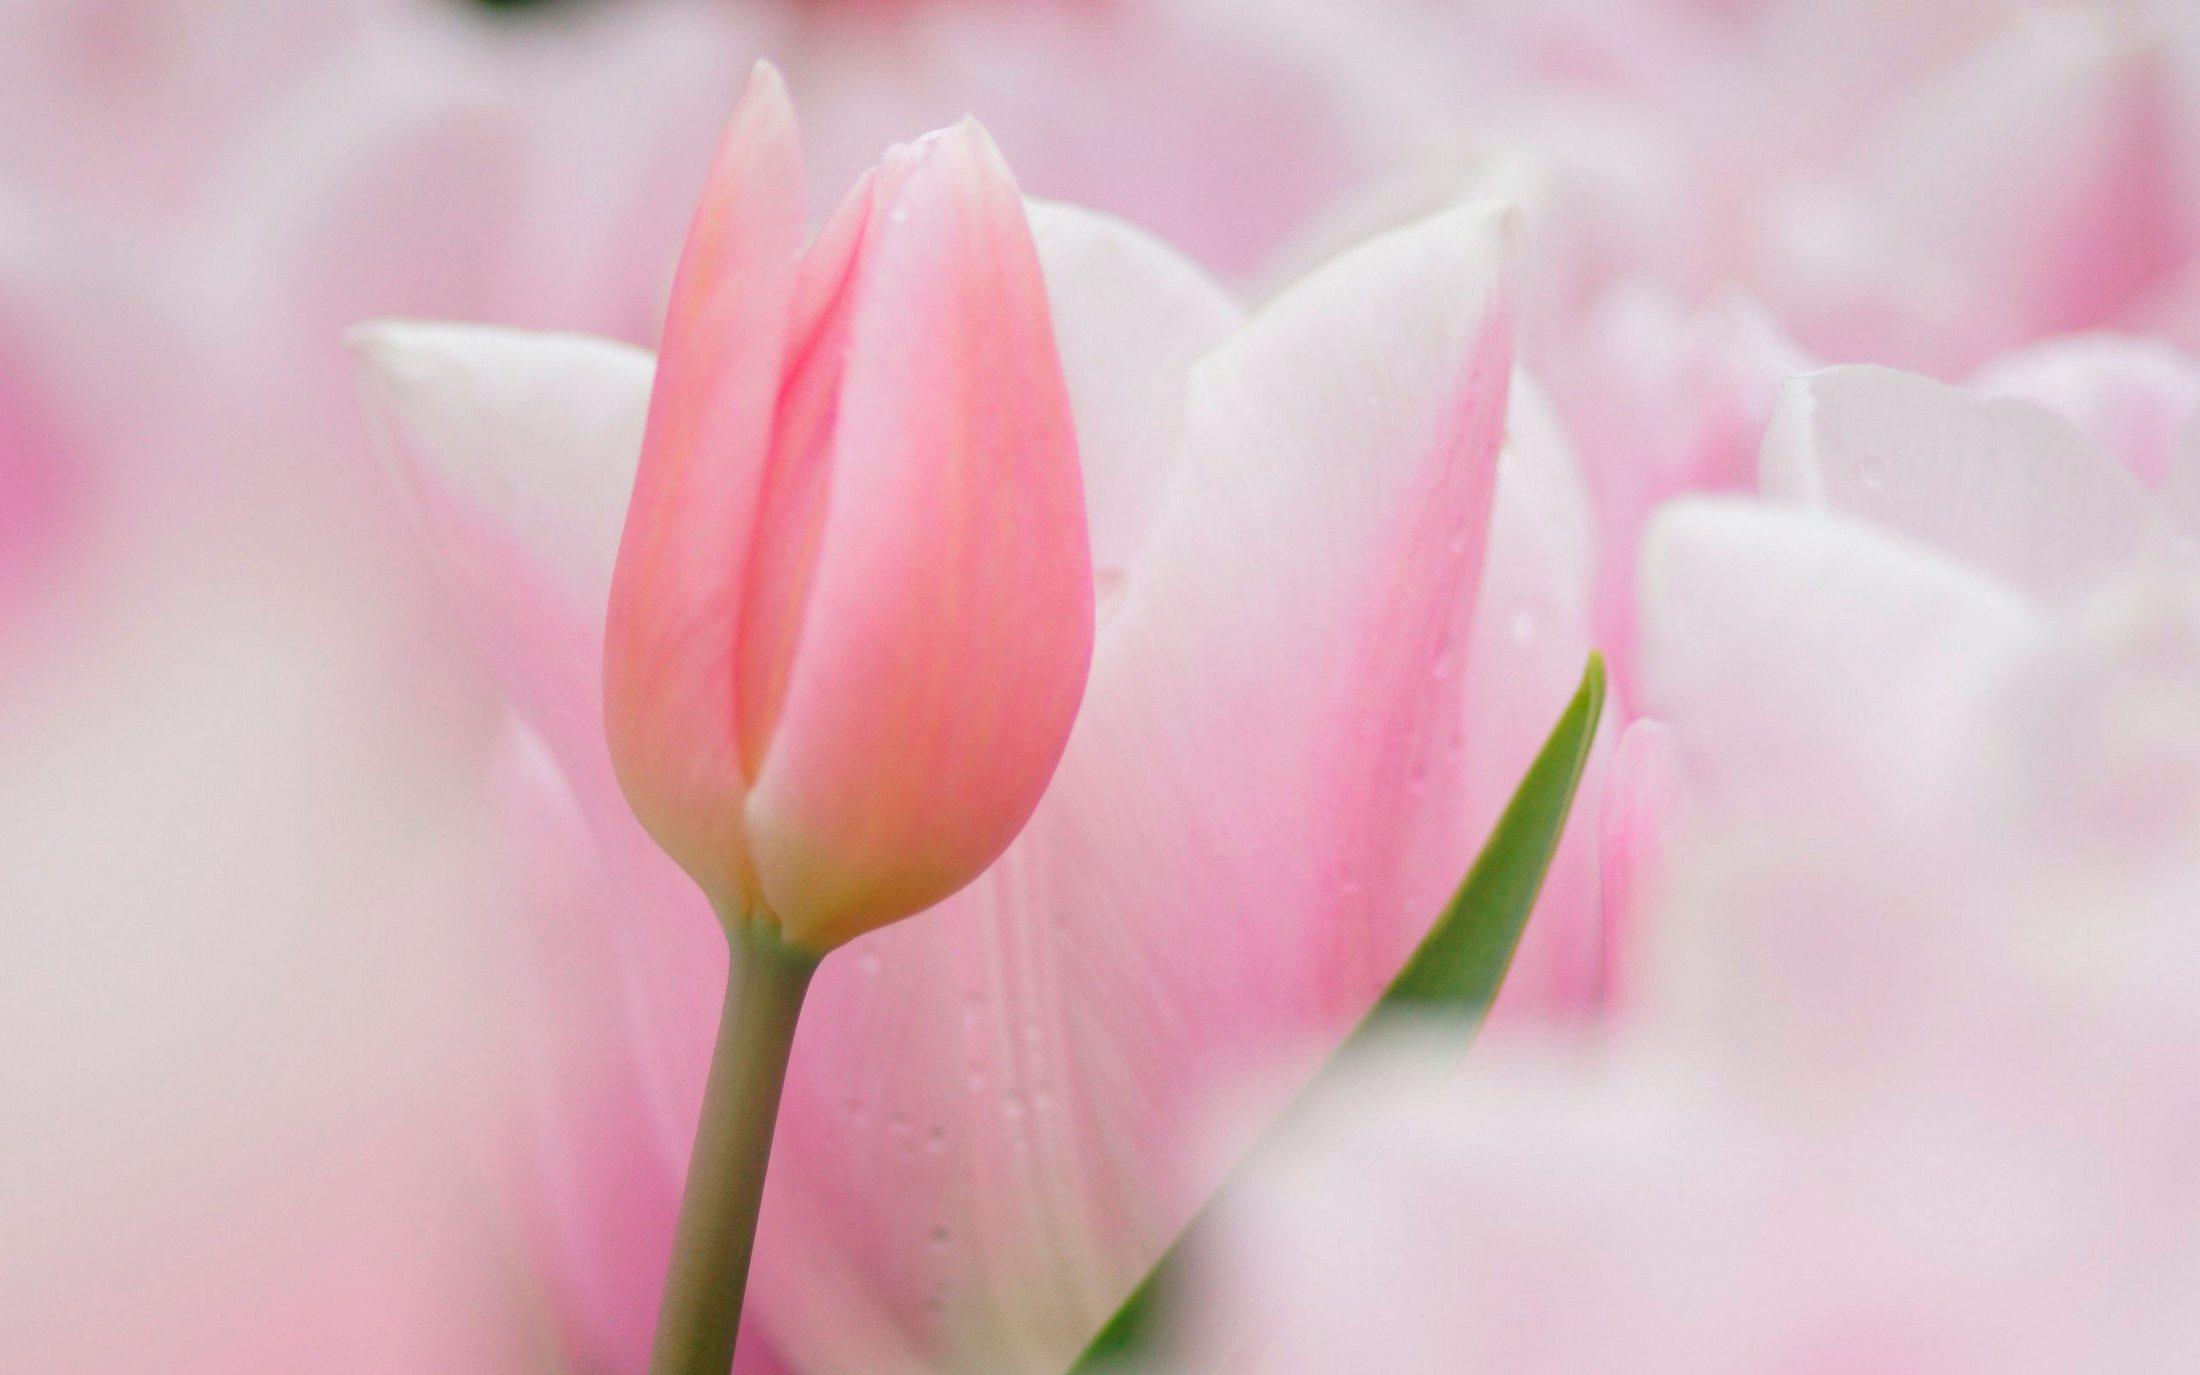 розовые нежные цветы